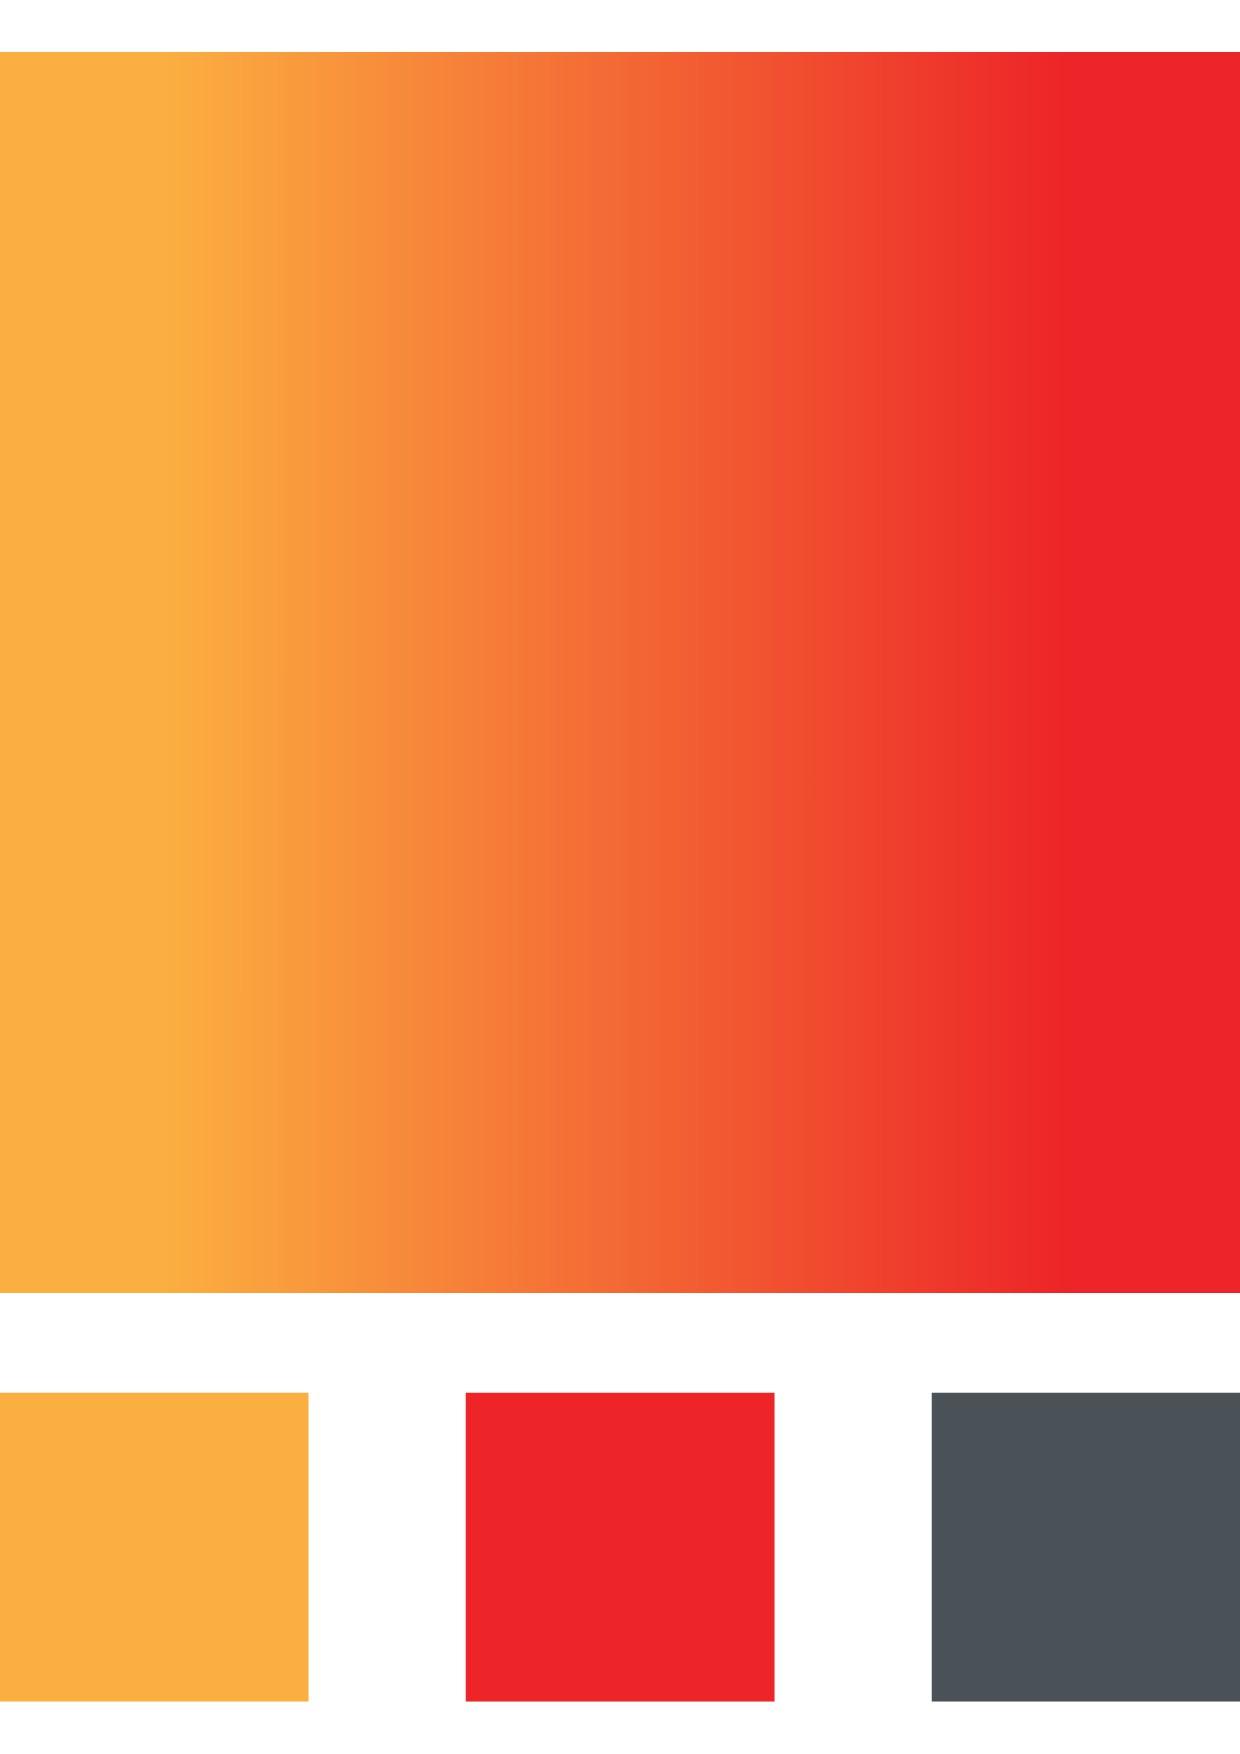 Logo on Impulse / Pulse theme. Need a warm and energic logo for web agency